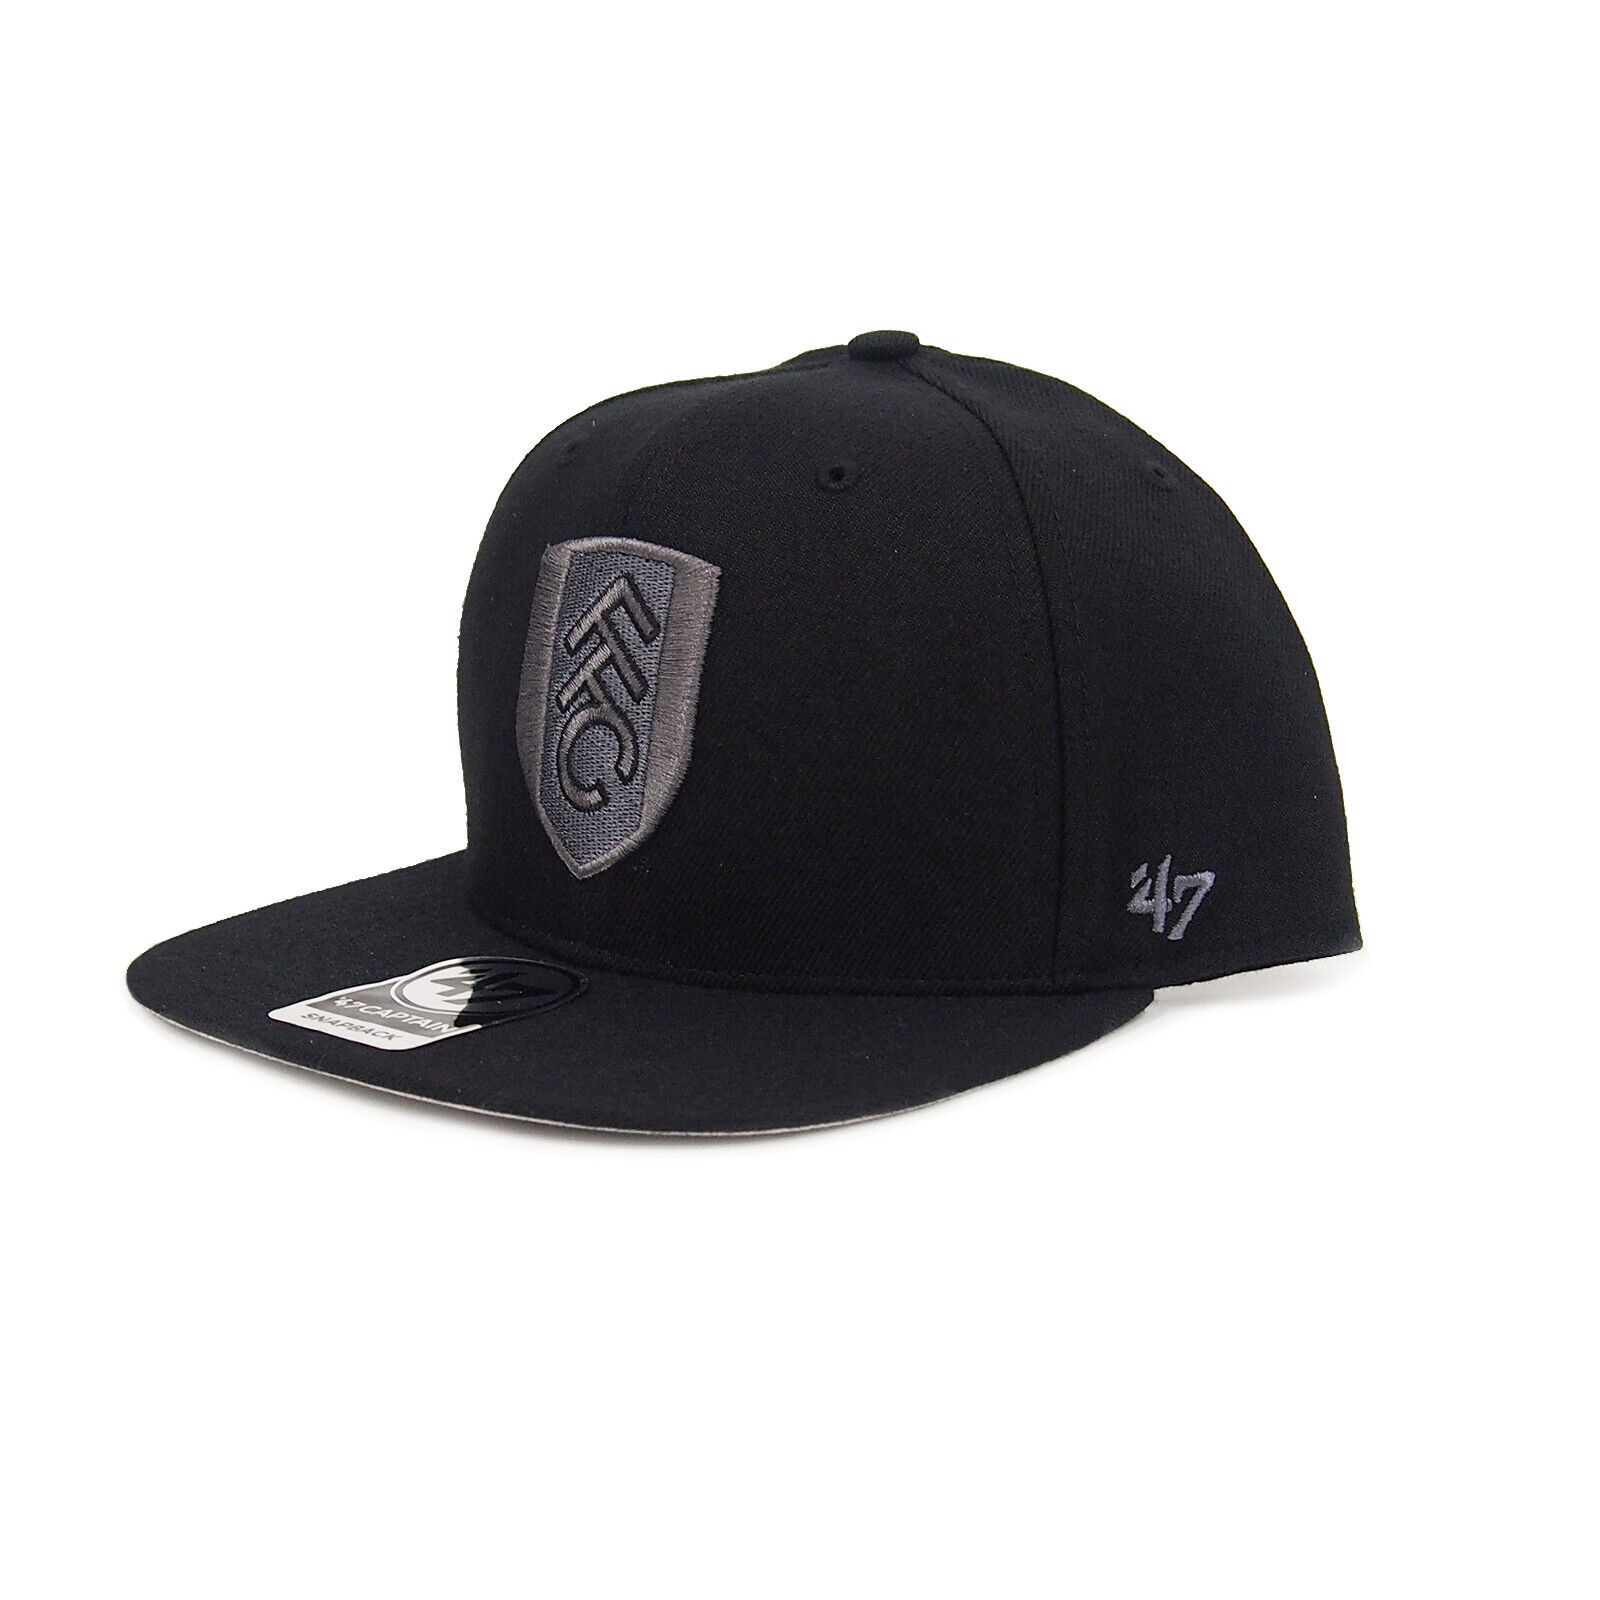 Manchester City FC Sky Blue Mens Kleberg Baseball Cap Hat New Crest Official